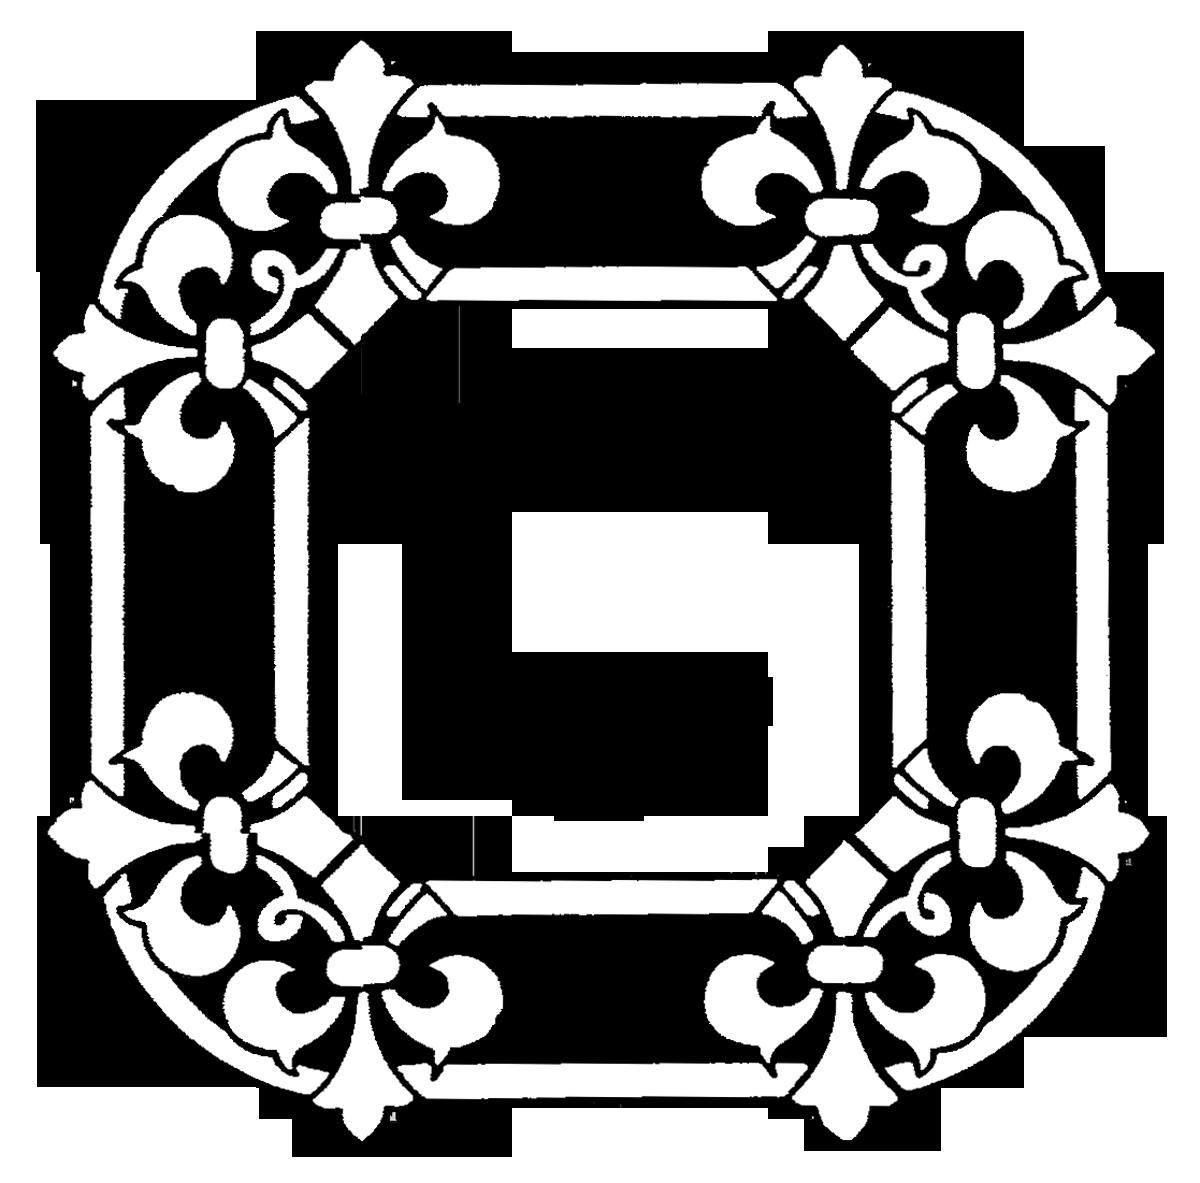 Similiar Monogram Letter C Clip Art Keywords.